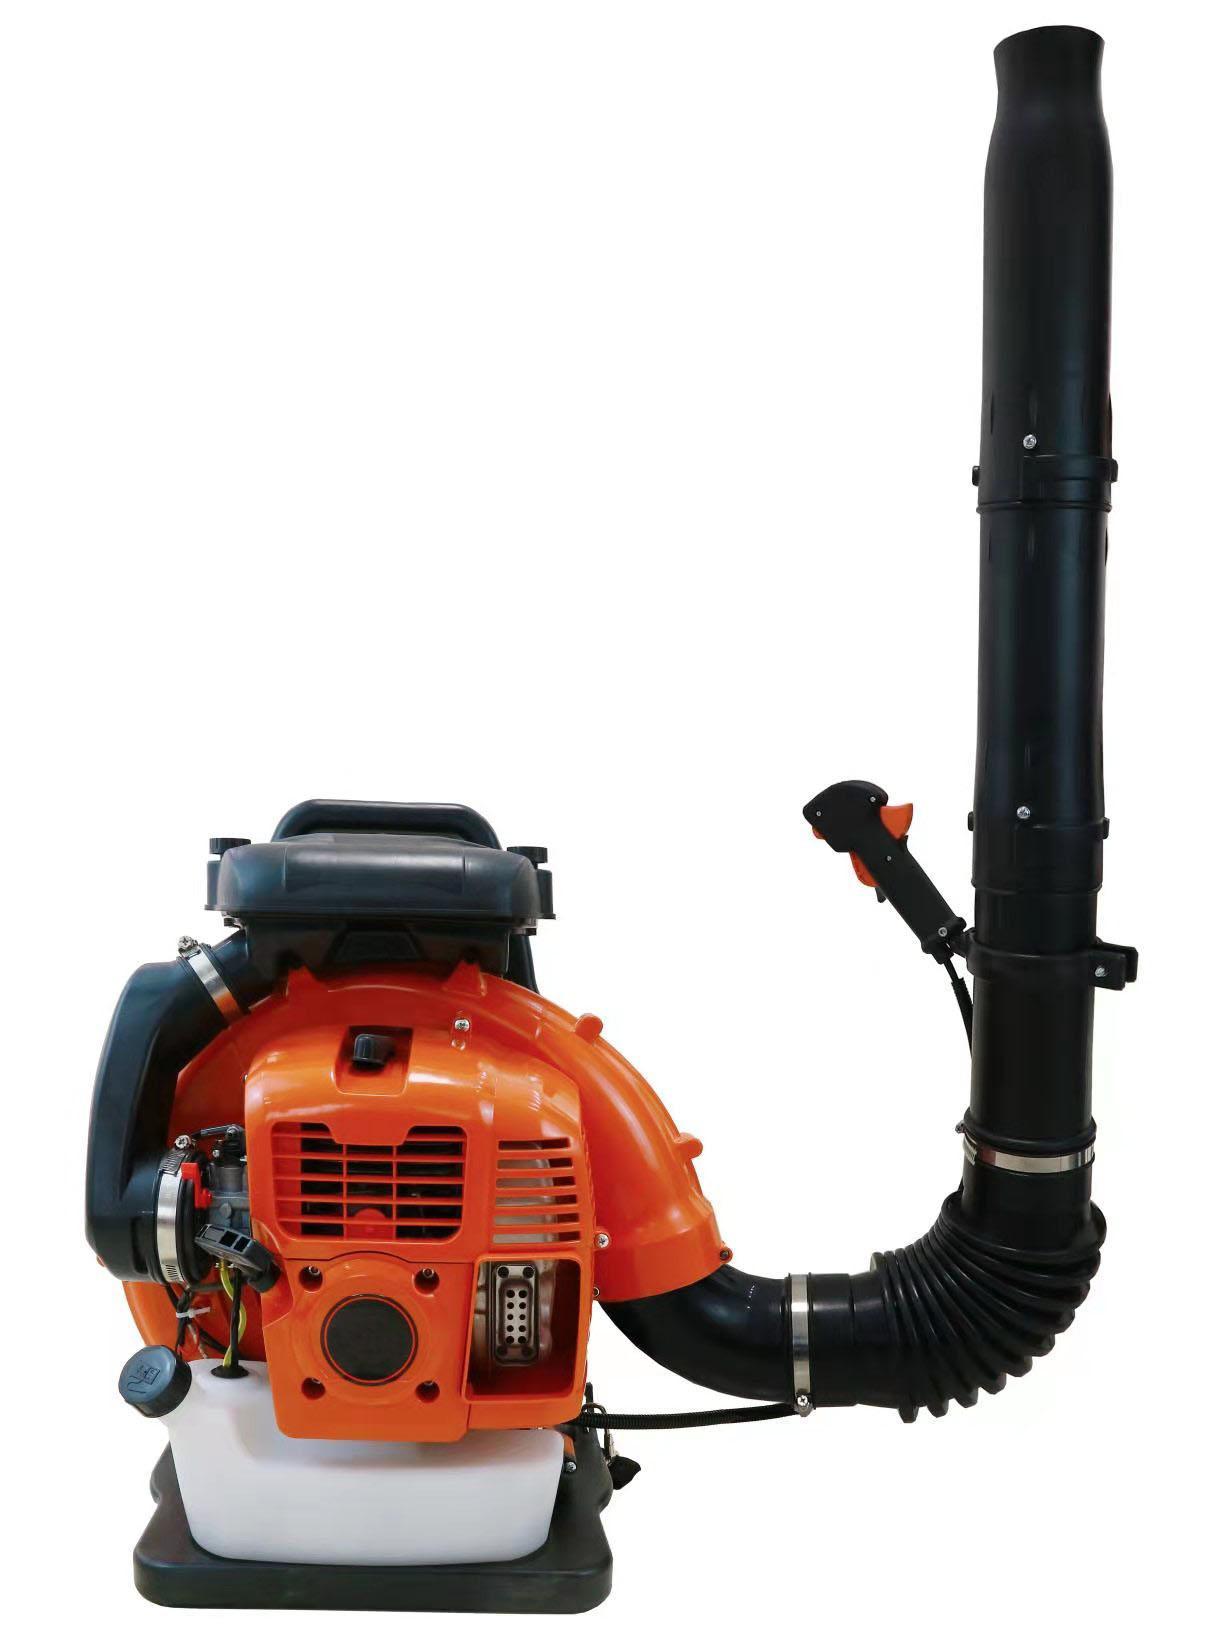 Garden Husqvarna two-stroke backpack engine  Snow blower wind Extinguisher  1